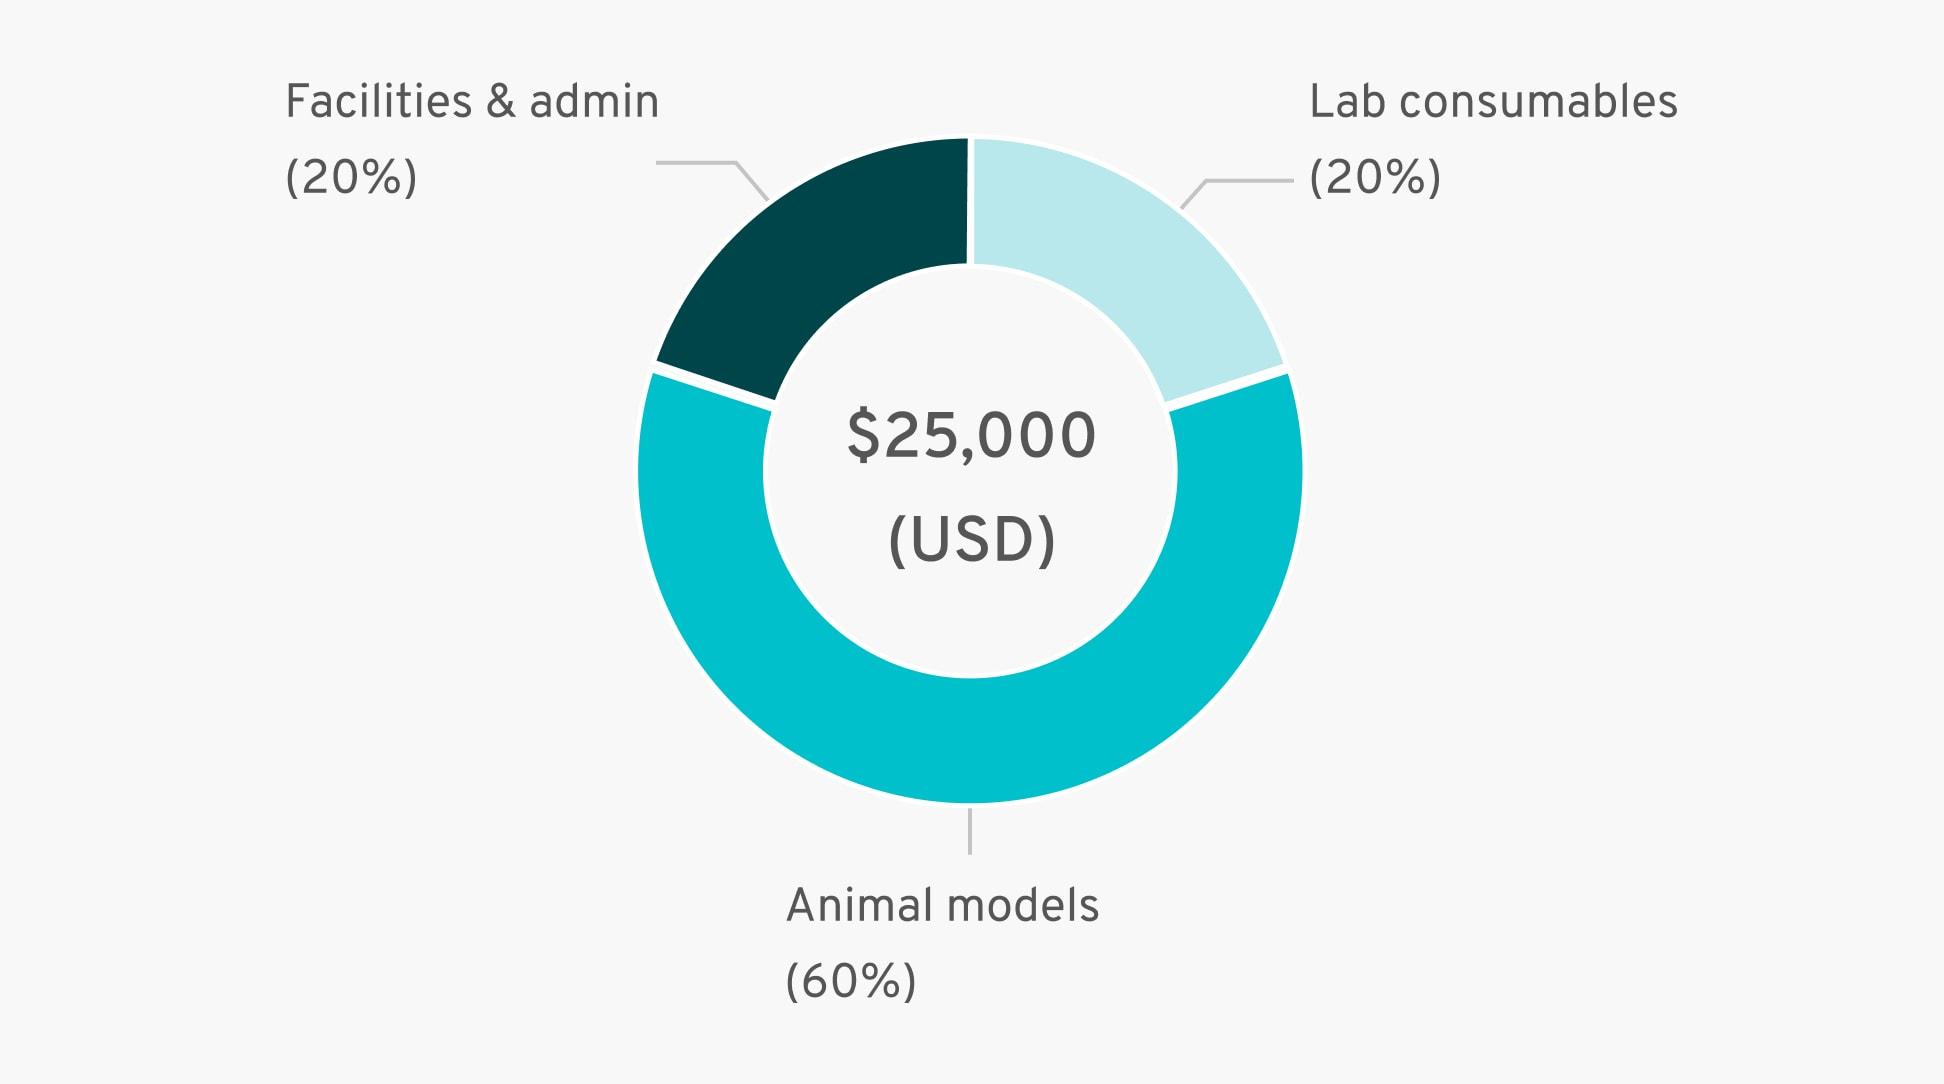 Facilities & admin (20%), Lab consumables (20%), Animal models (60%) = $25,000 (USD)